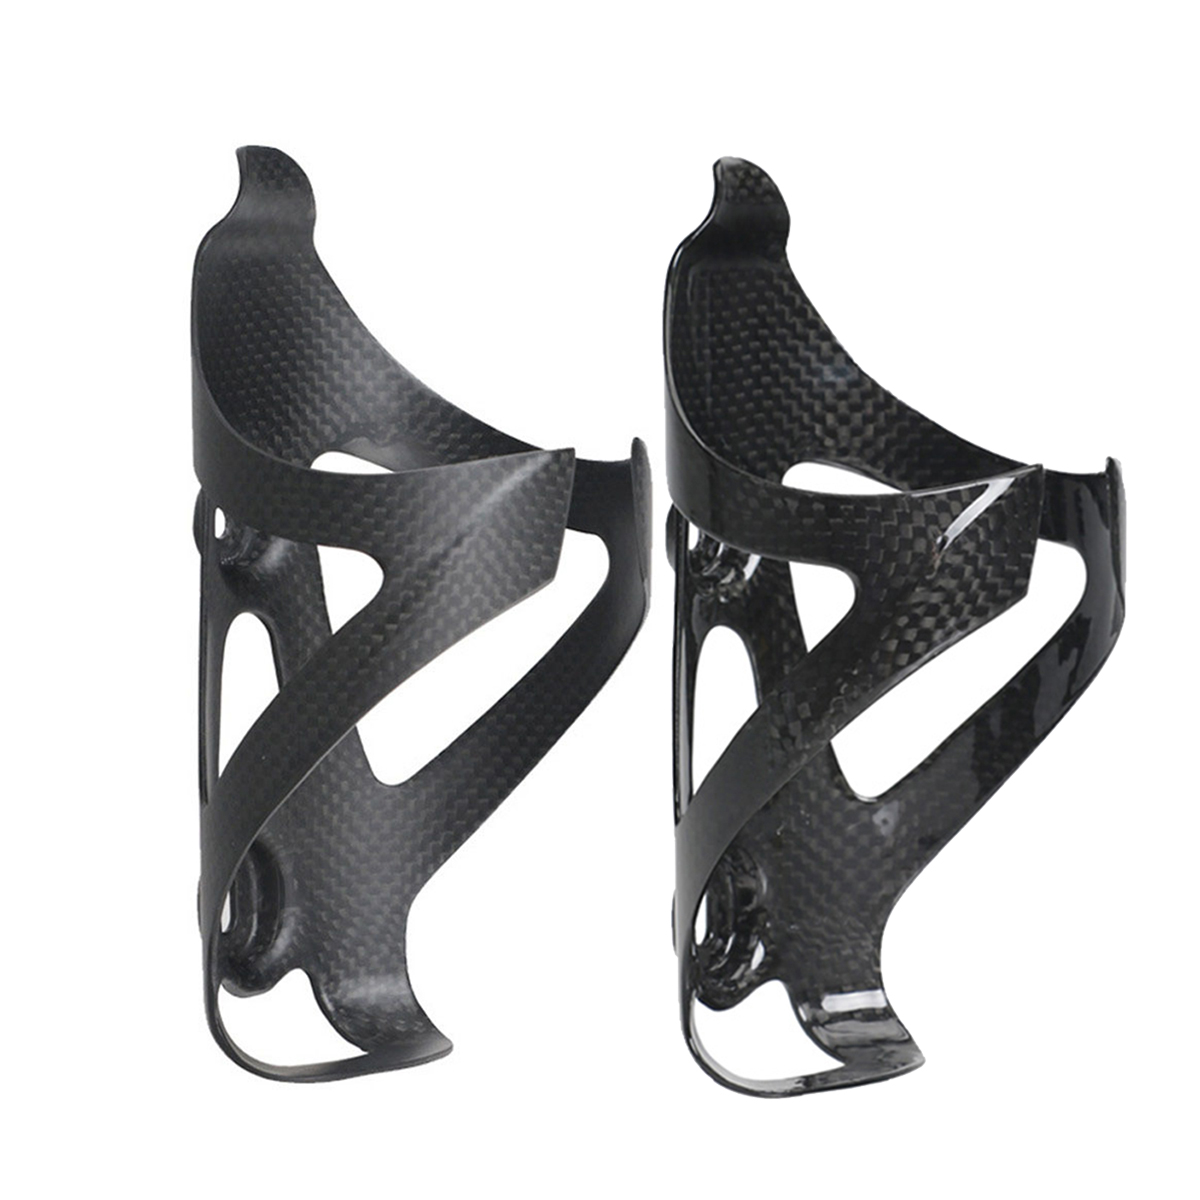 2Pcs Ultra-light Carbon Fiber MTB Road Bike Bicycle Water Bottle Holder Cage US